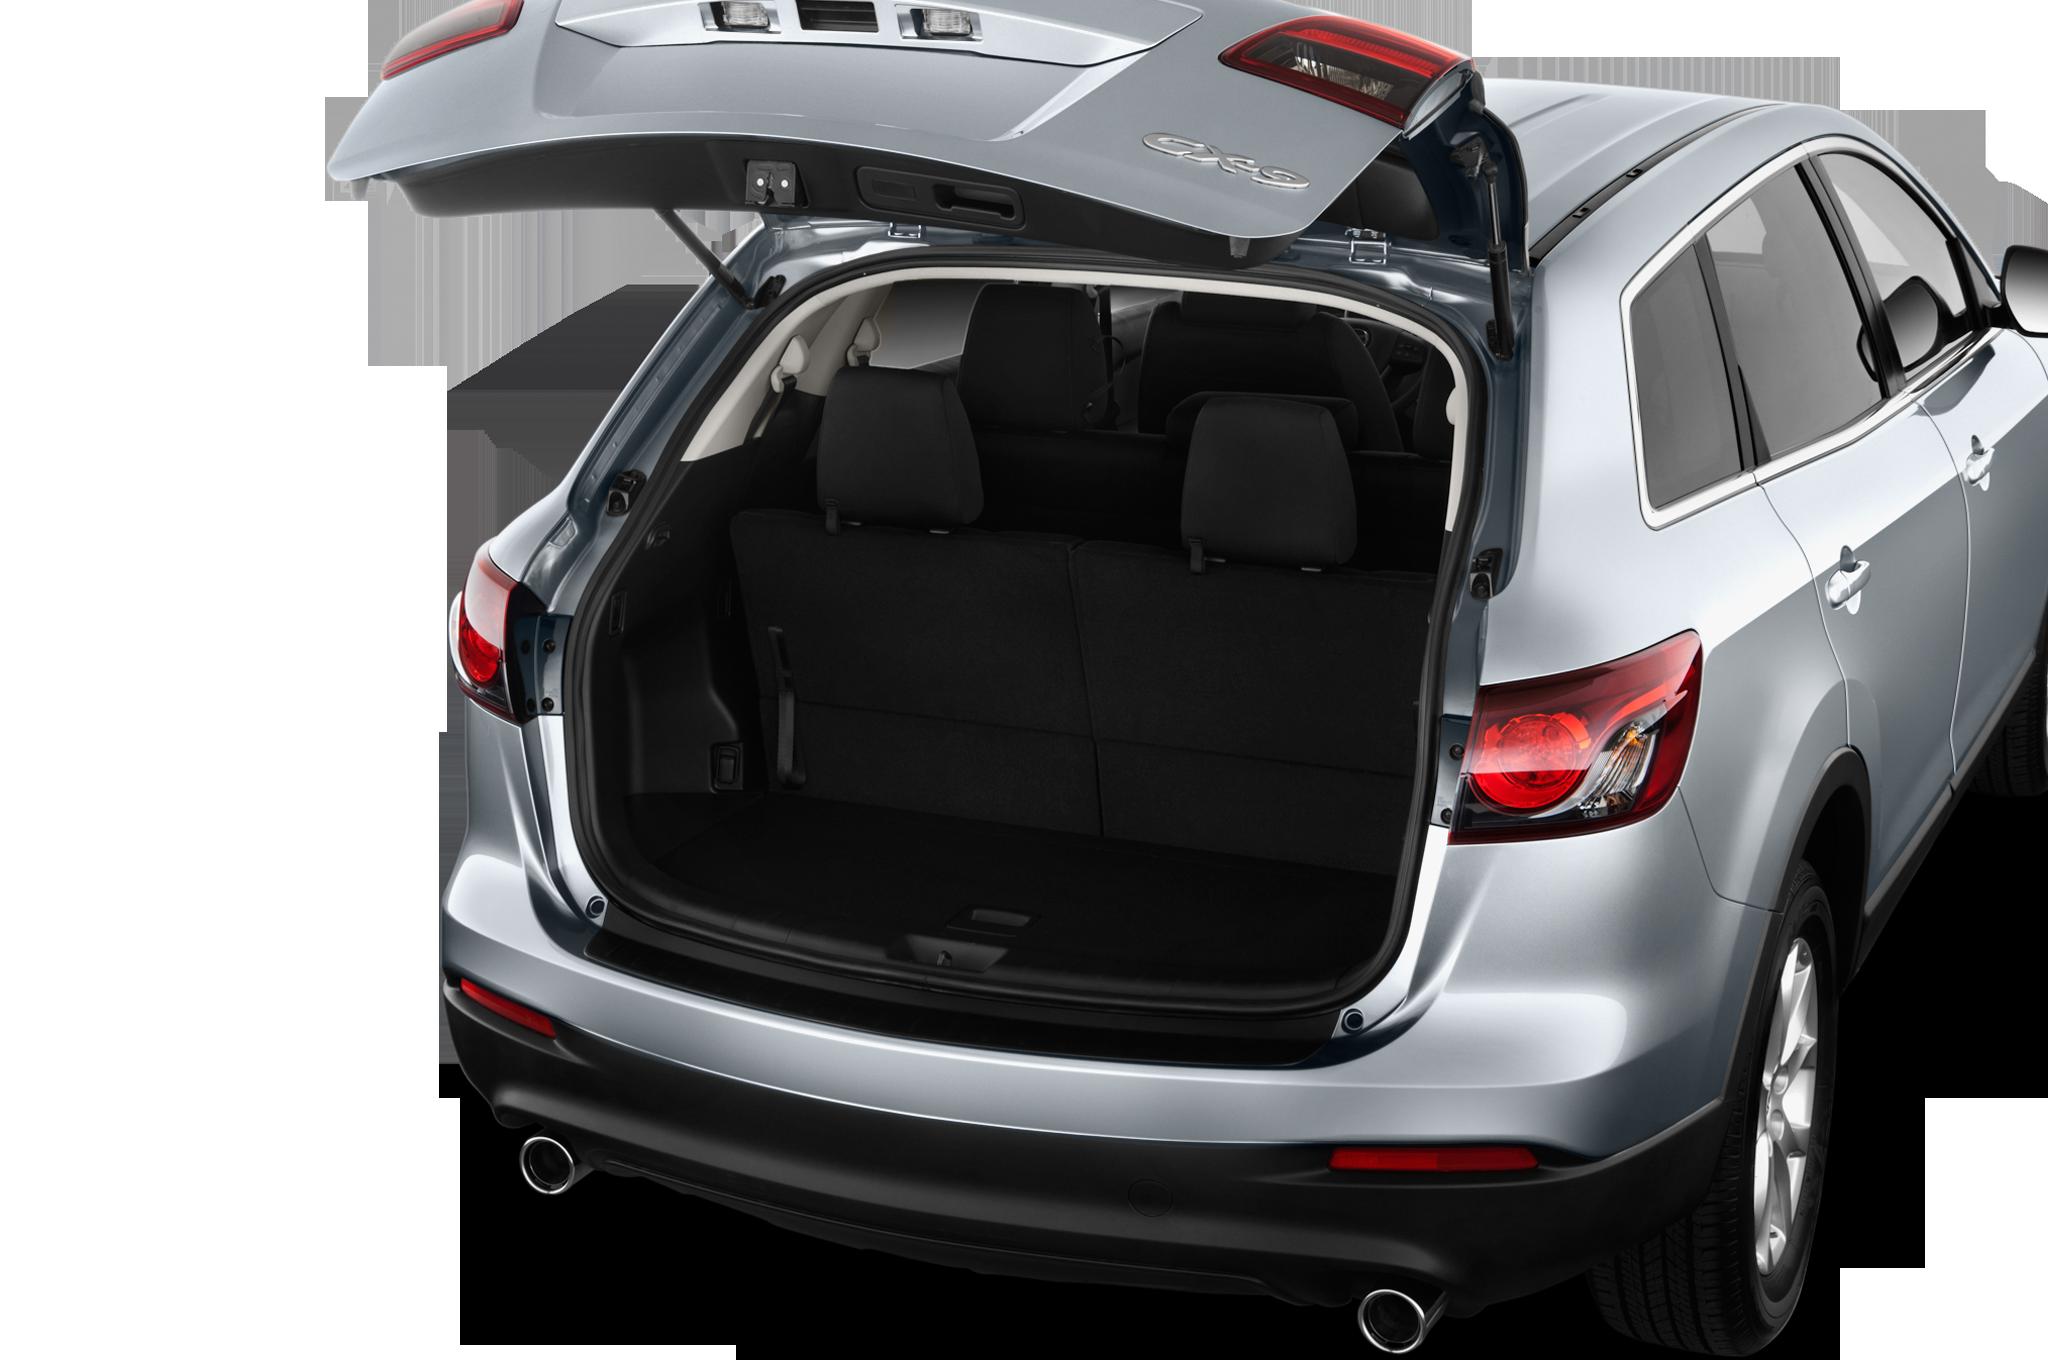 https://st.automobilemag.com/uploads/sites/10/2015/11/2013-mazda-cx9-sport-fwd-suv-trunk.png